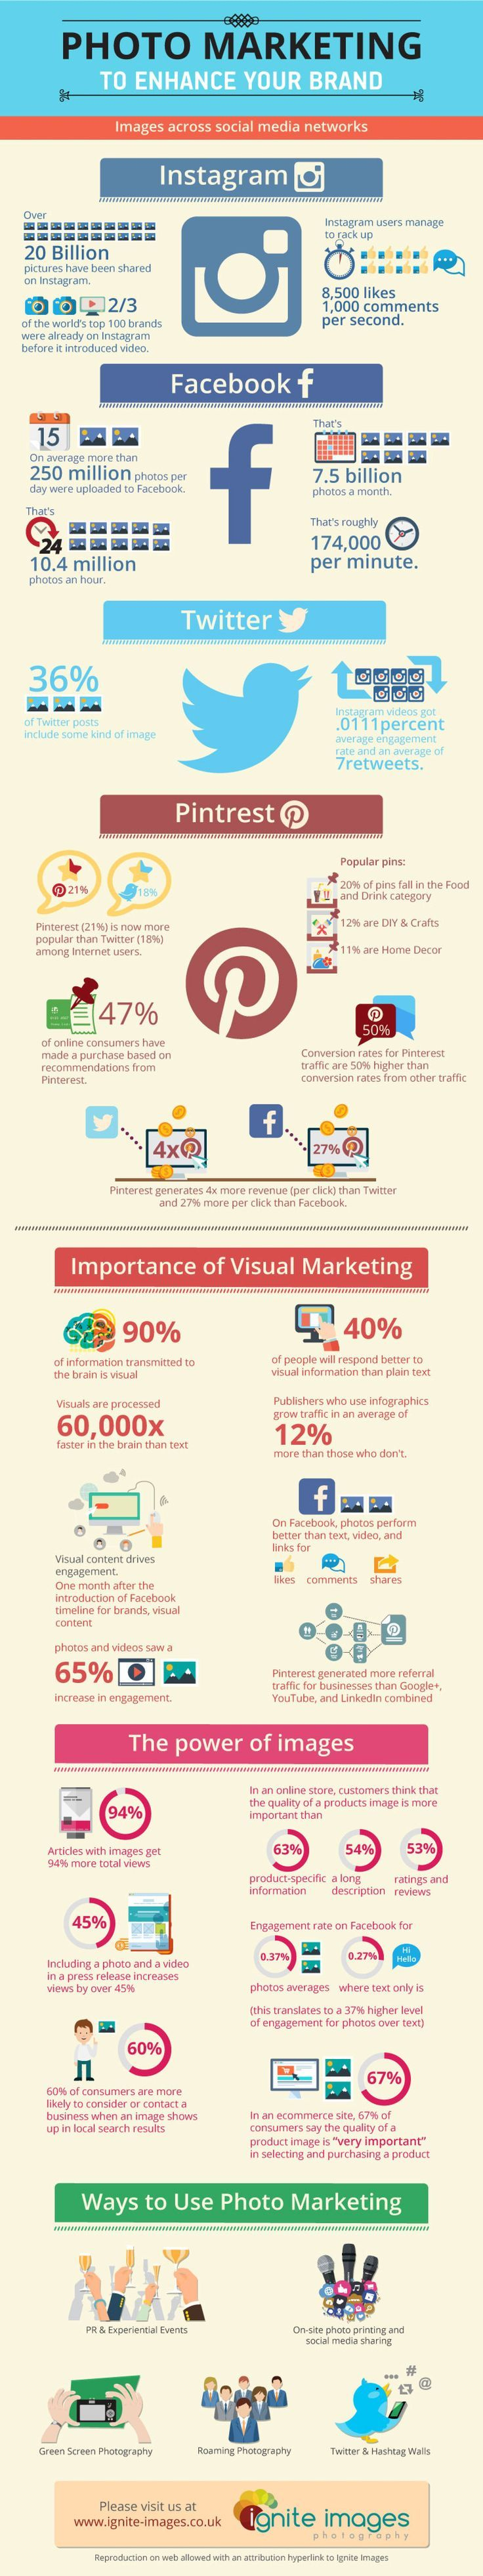 Photo marketing to enhance your brand.